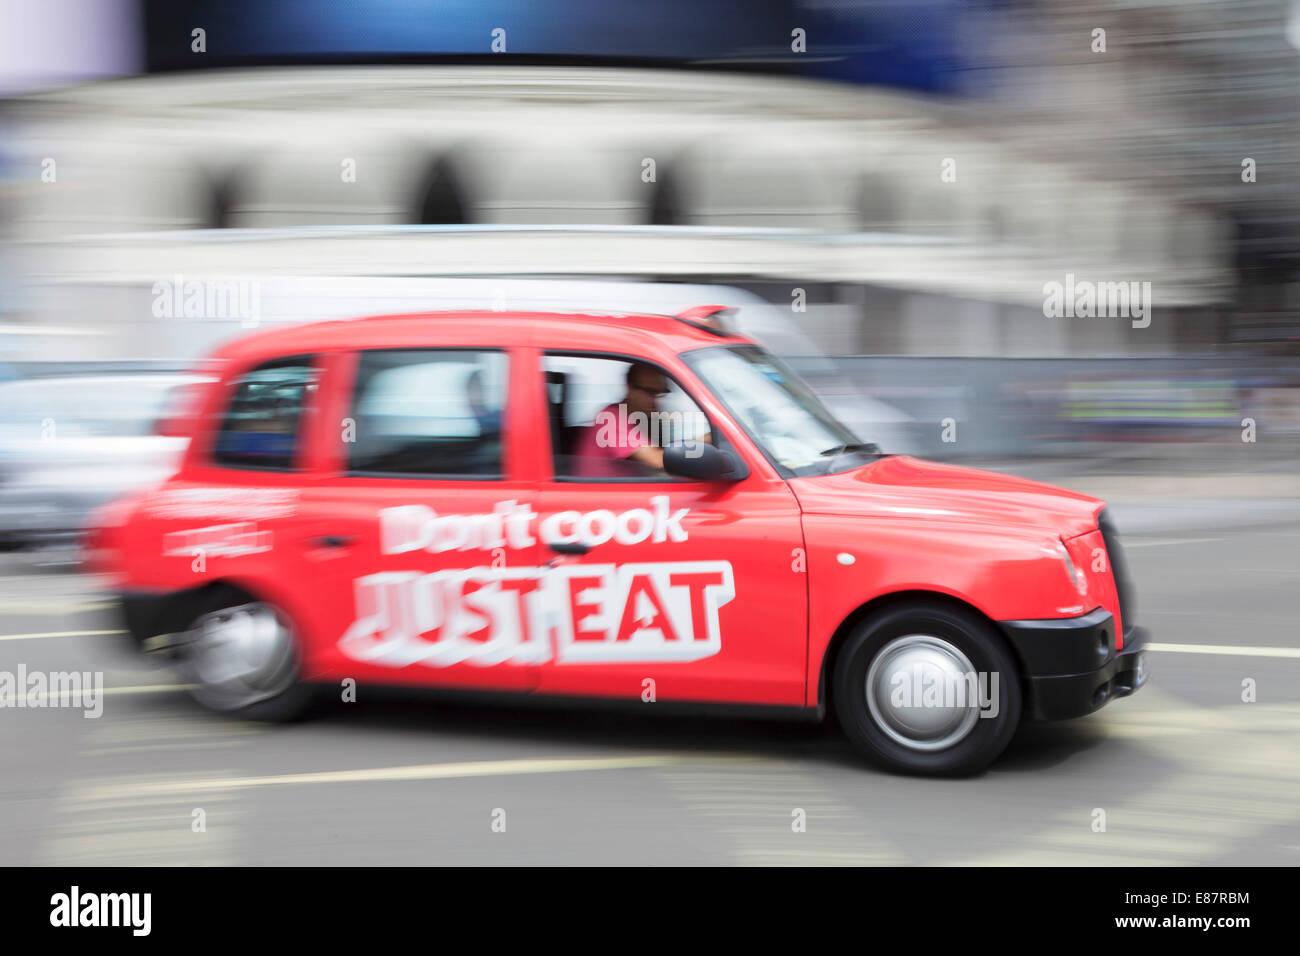 Taxi, Bewegungsunschärfe, Piccadilly Circus, London, England, Vereinigtes Königreich Stockbild